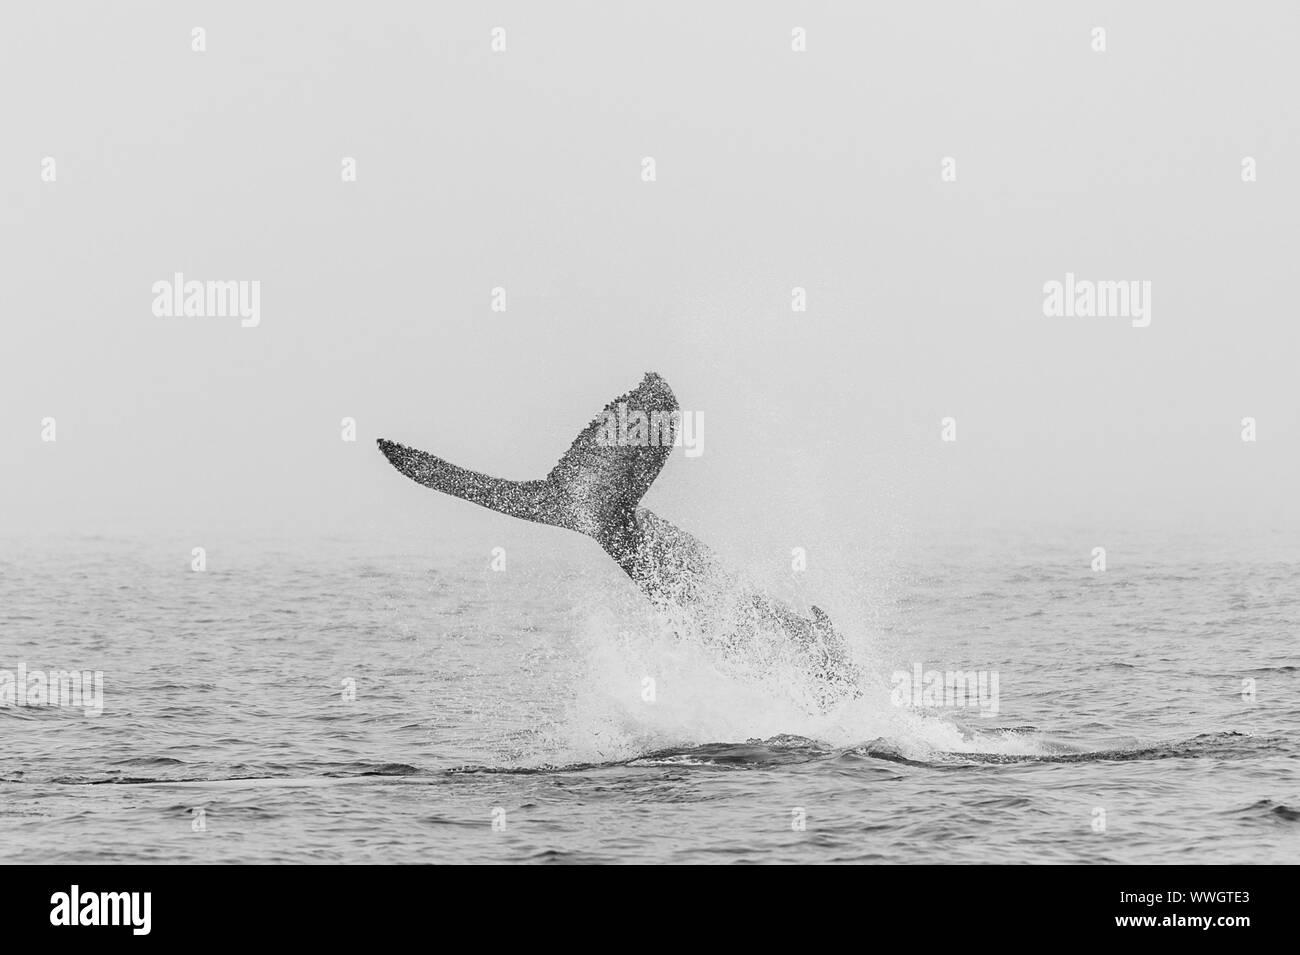 La cola de una ballena jorobada (Megaptera novaeangliae- que emergen de la superficie del océano, cerca de Walvis Bay (Namibia). Foto de stock